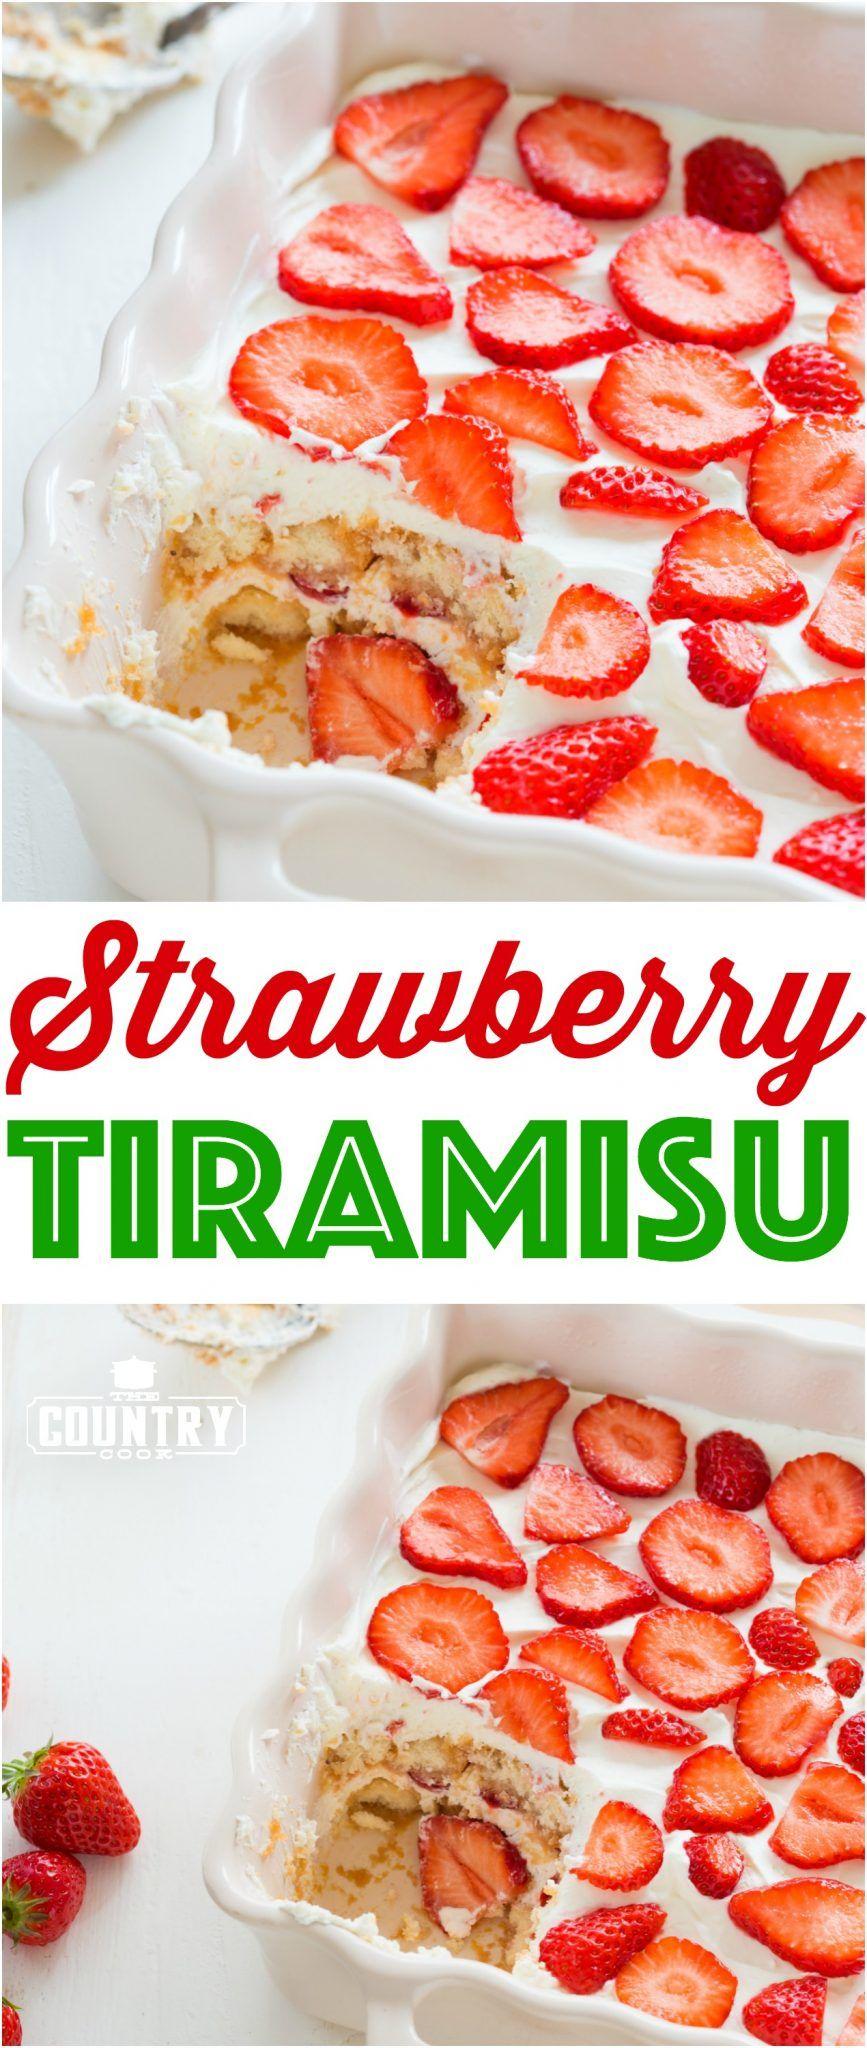 No-Bake Strawberry Tiramisu recipe from The Country Cook